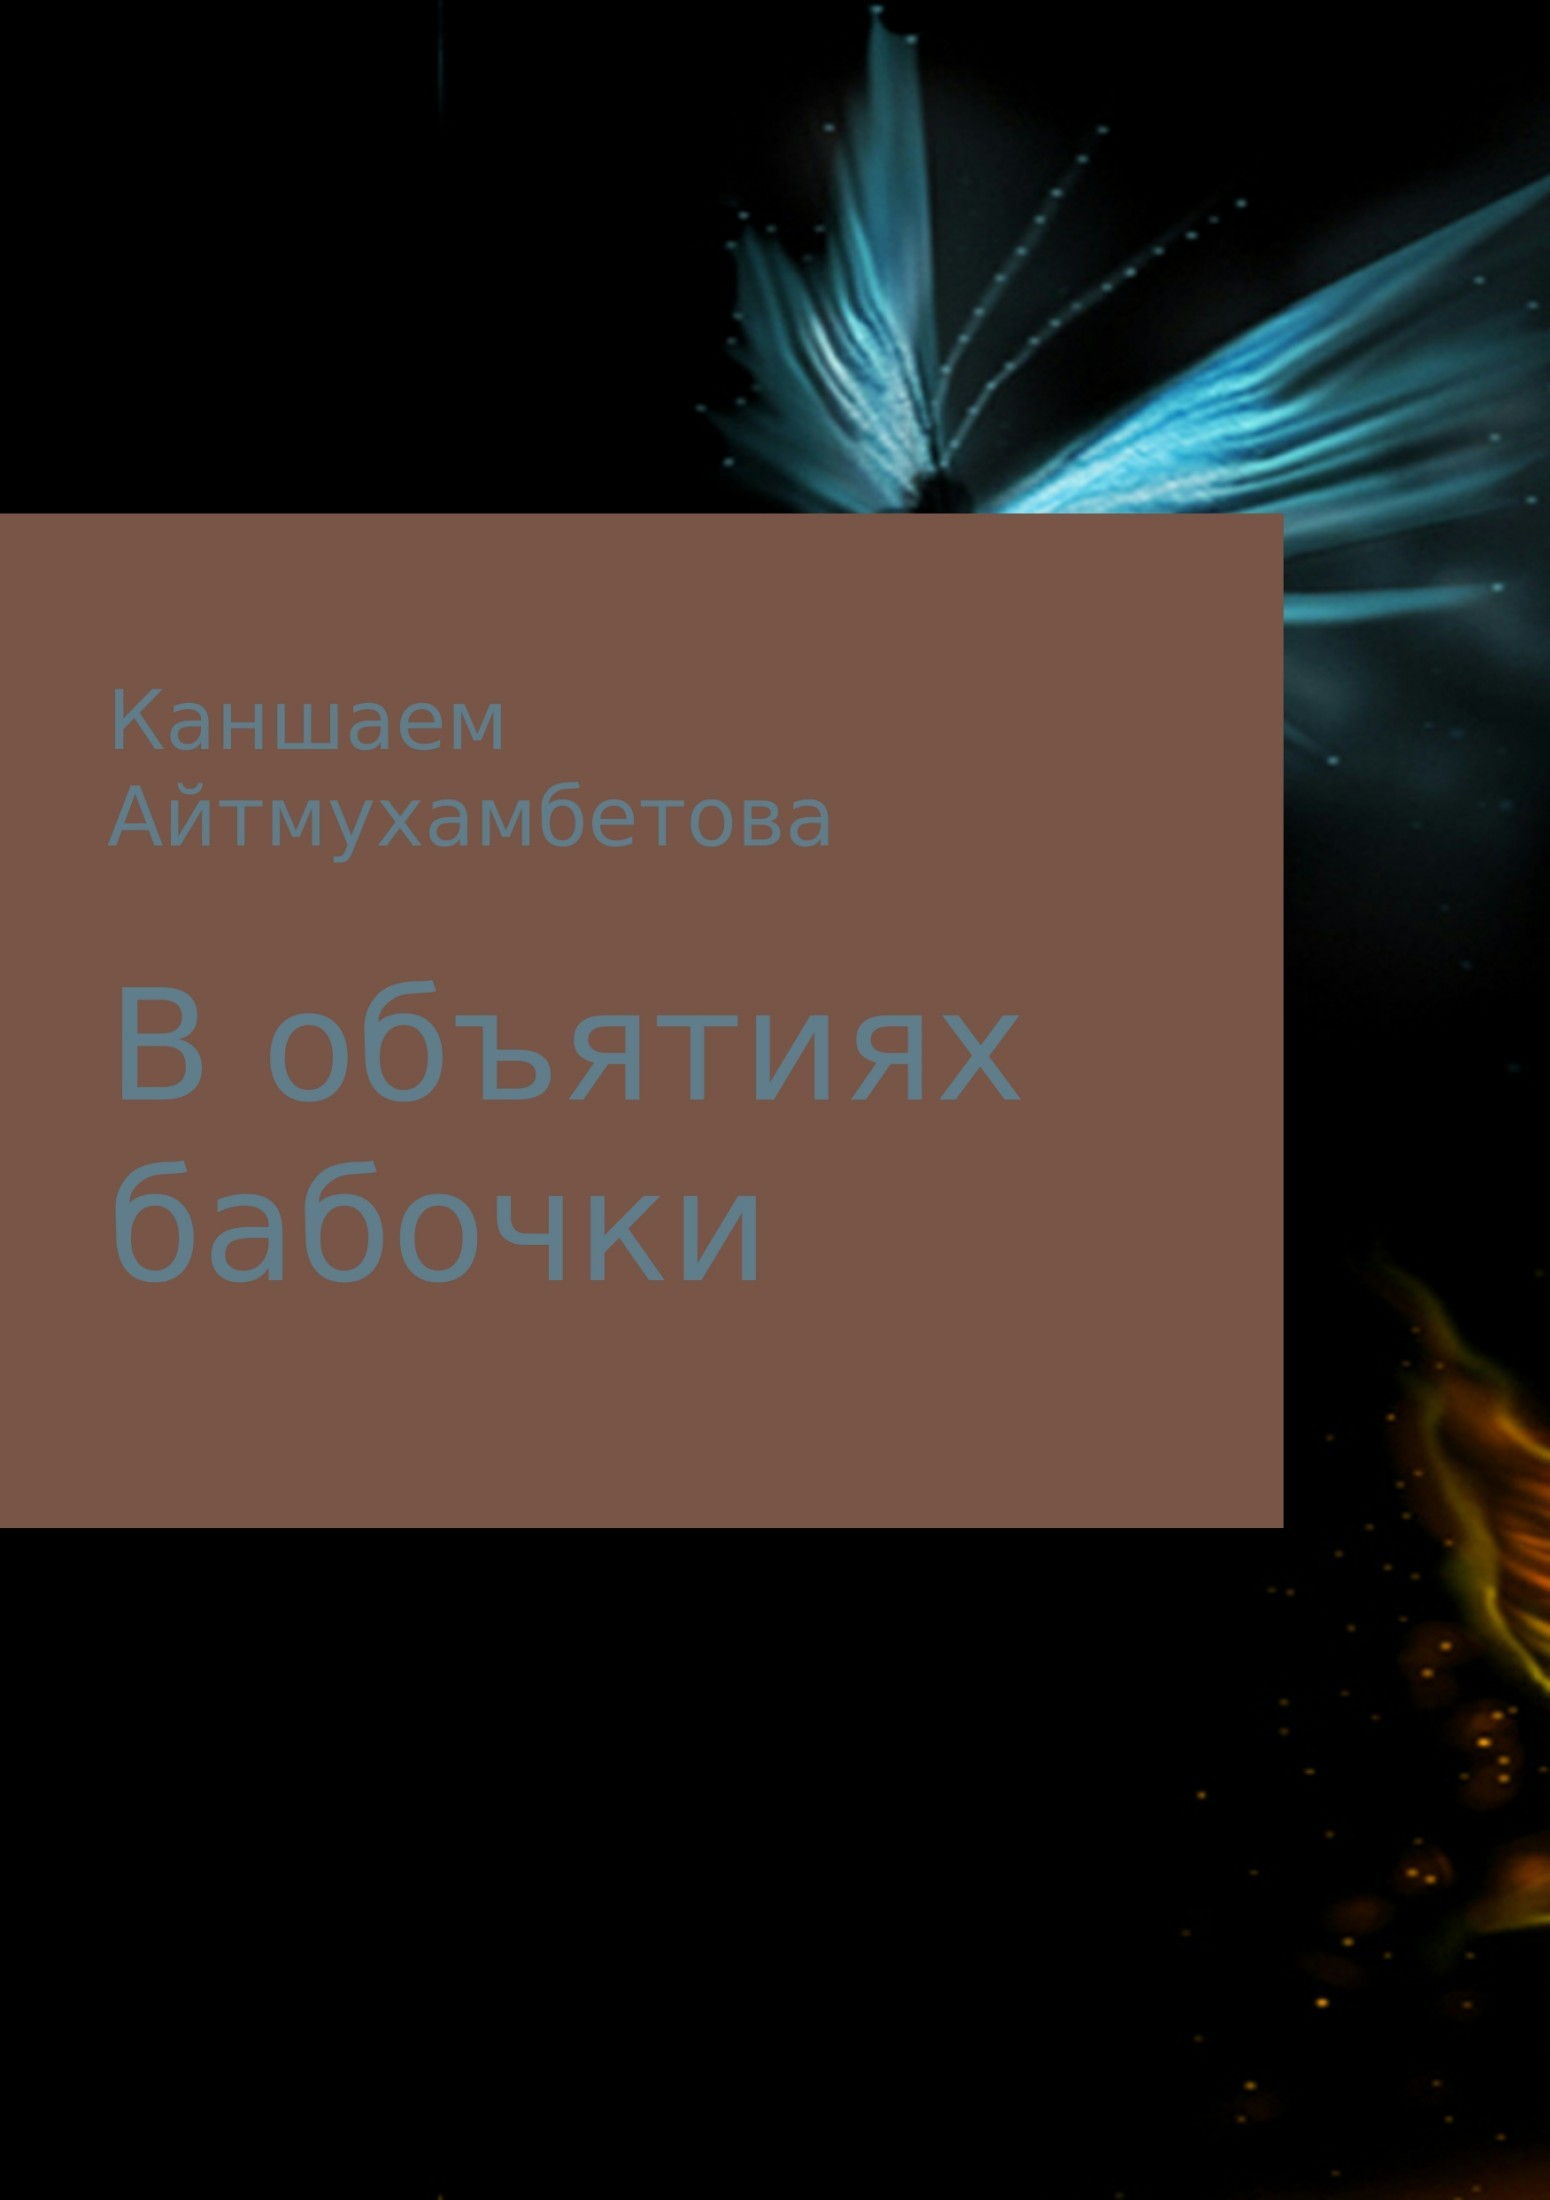 Каншаем Карисовна Айтмухамбетова В объятиях бабочки каншаем карисовна айтмухамбетова каникулы